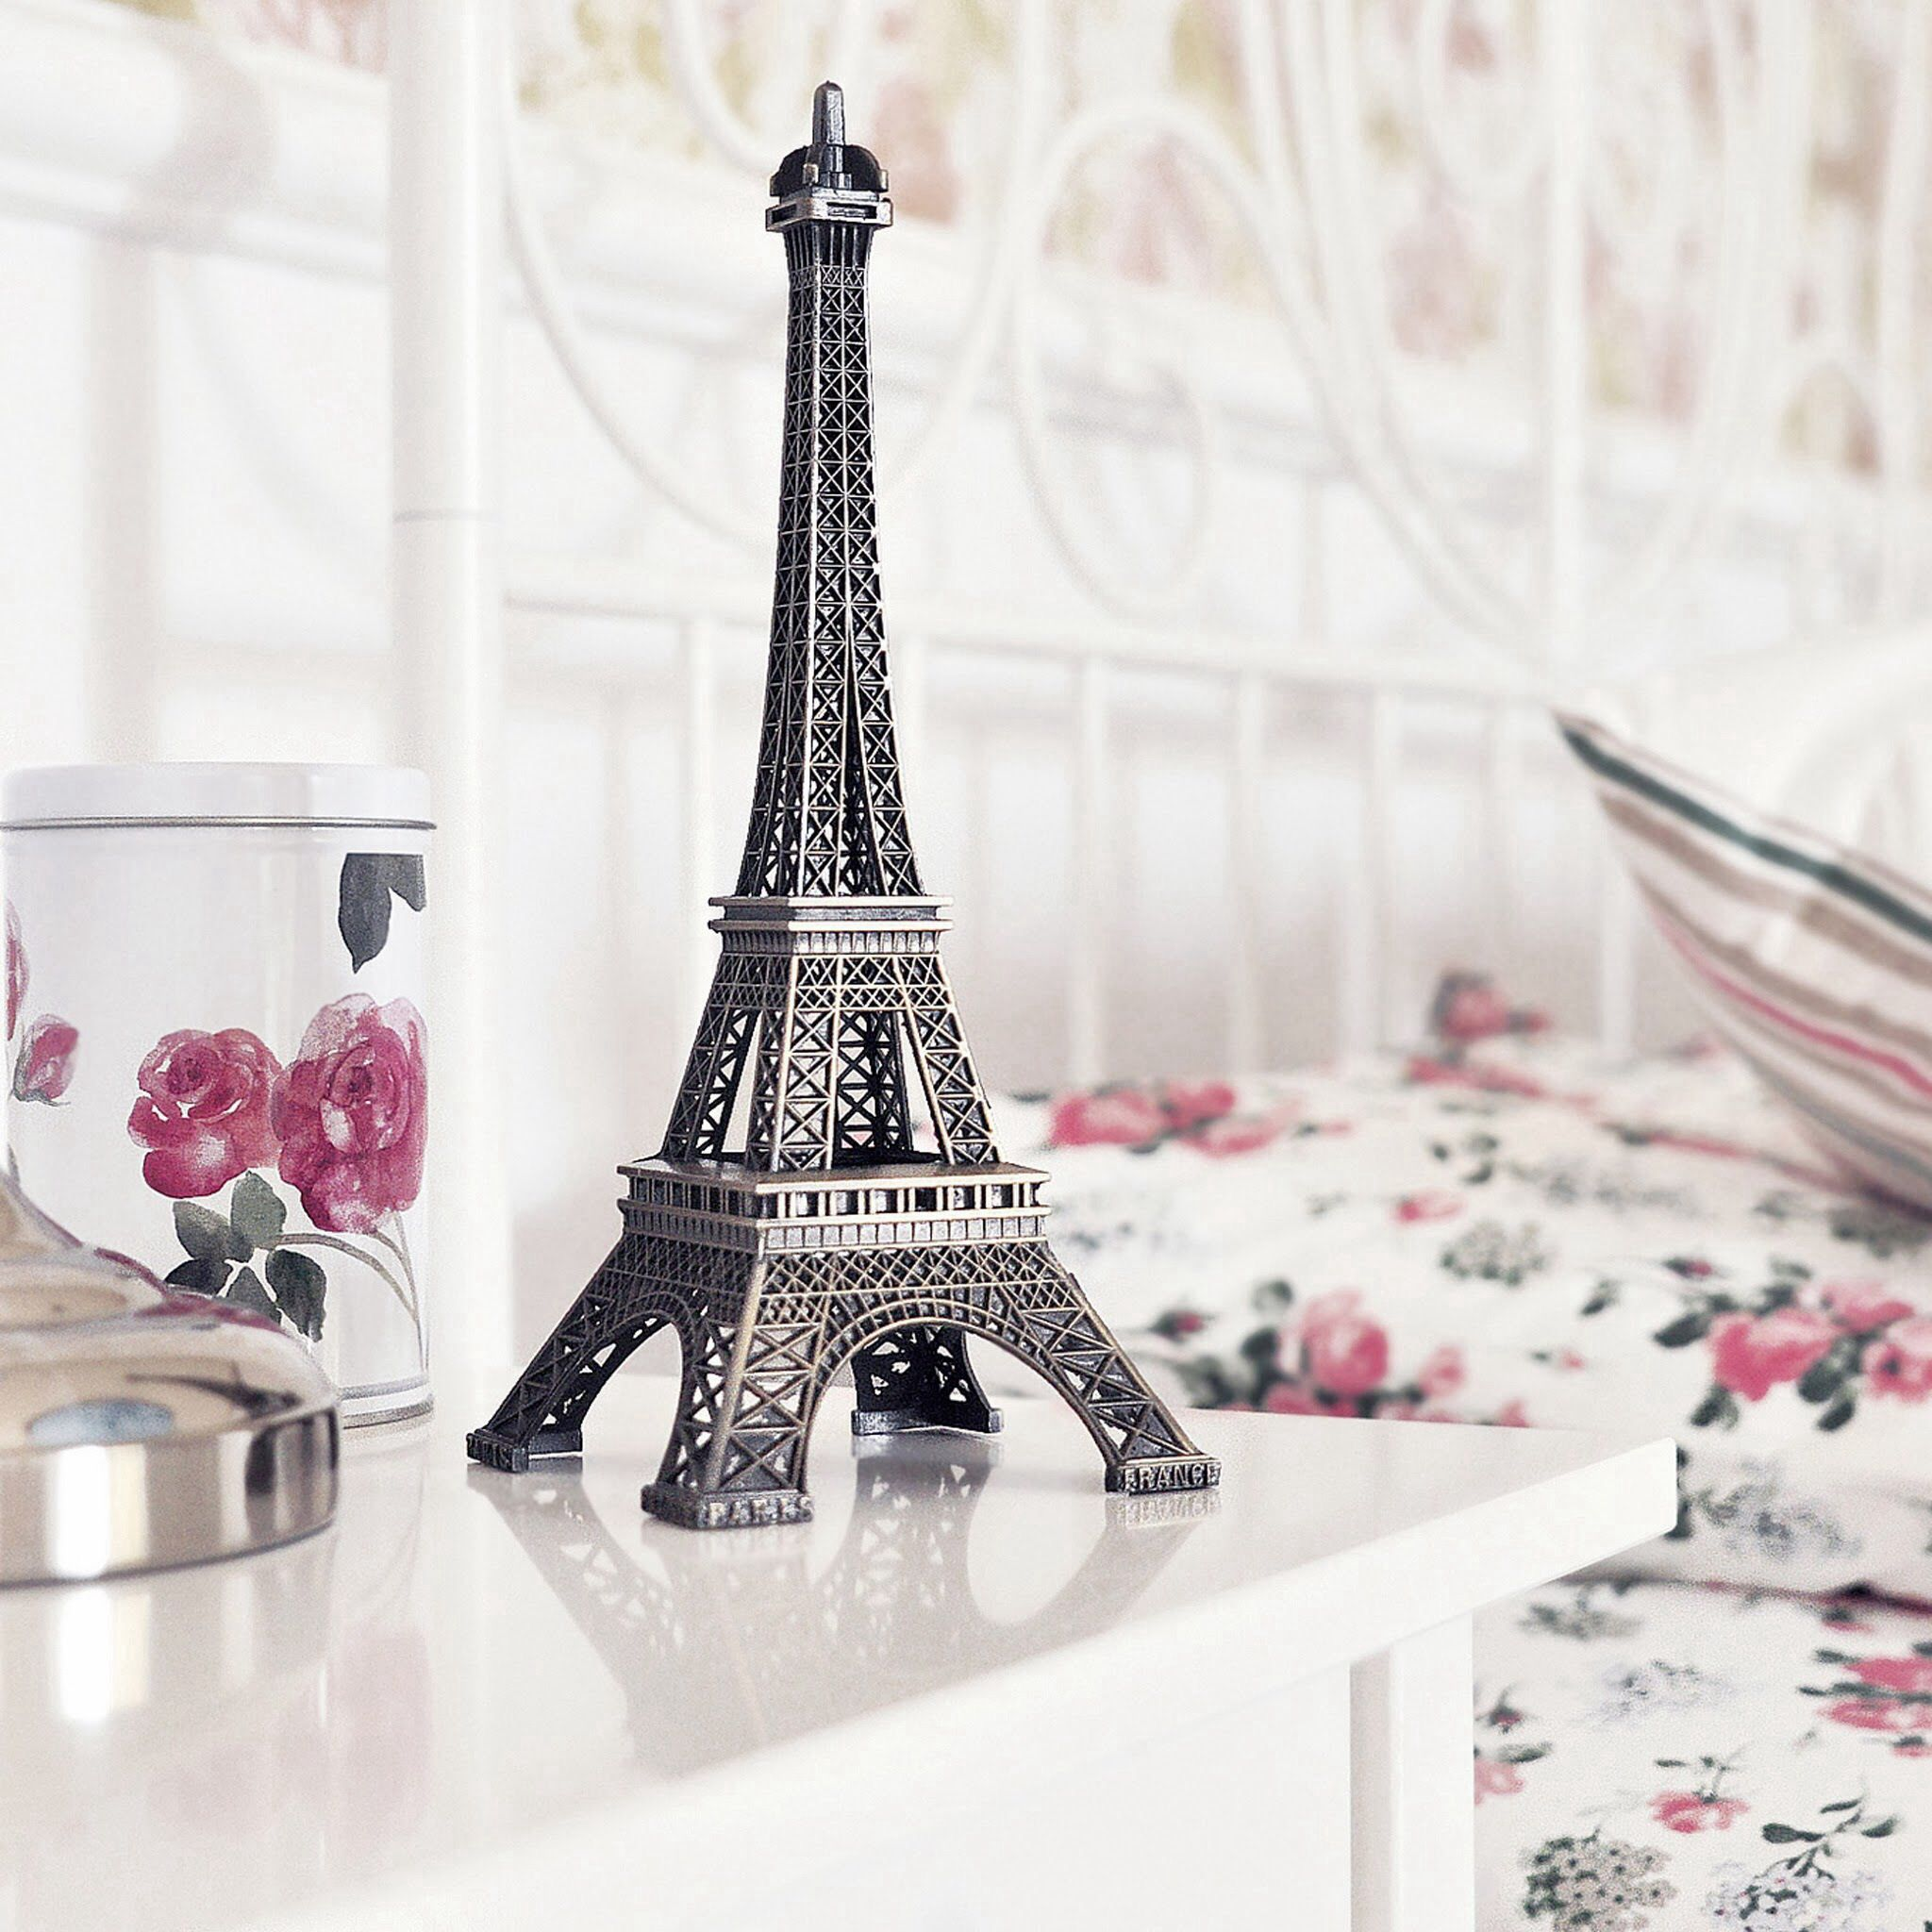 Paris Wallpaper Bedroom For Ios 7 Ipad Or Iphone Wallpaper Paris 2 Girl Zone